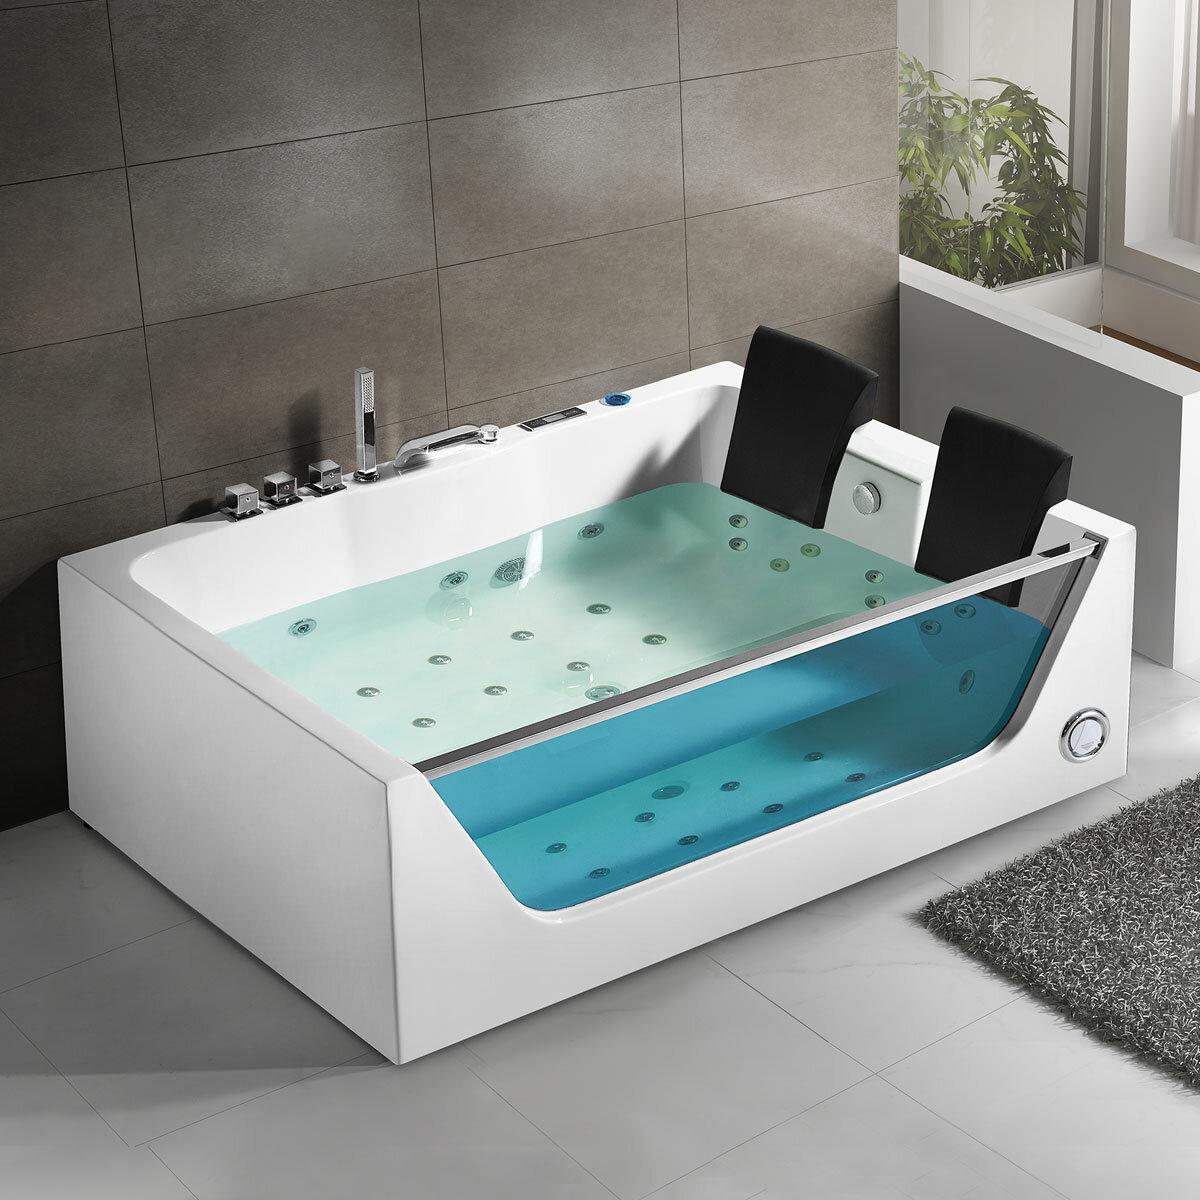 Decoraport 71 X 47 Freestanding Whirlpool Bathtub Wayfair